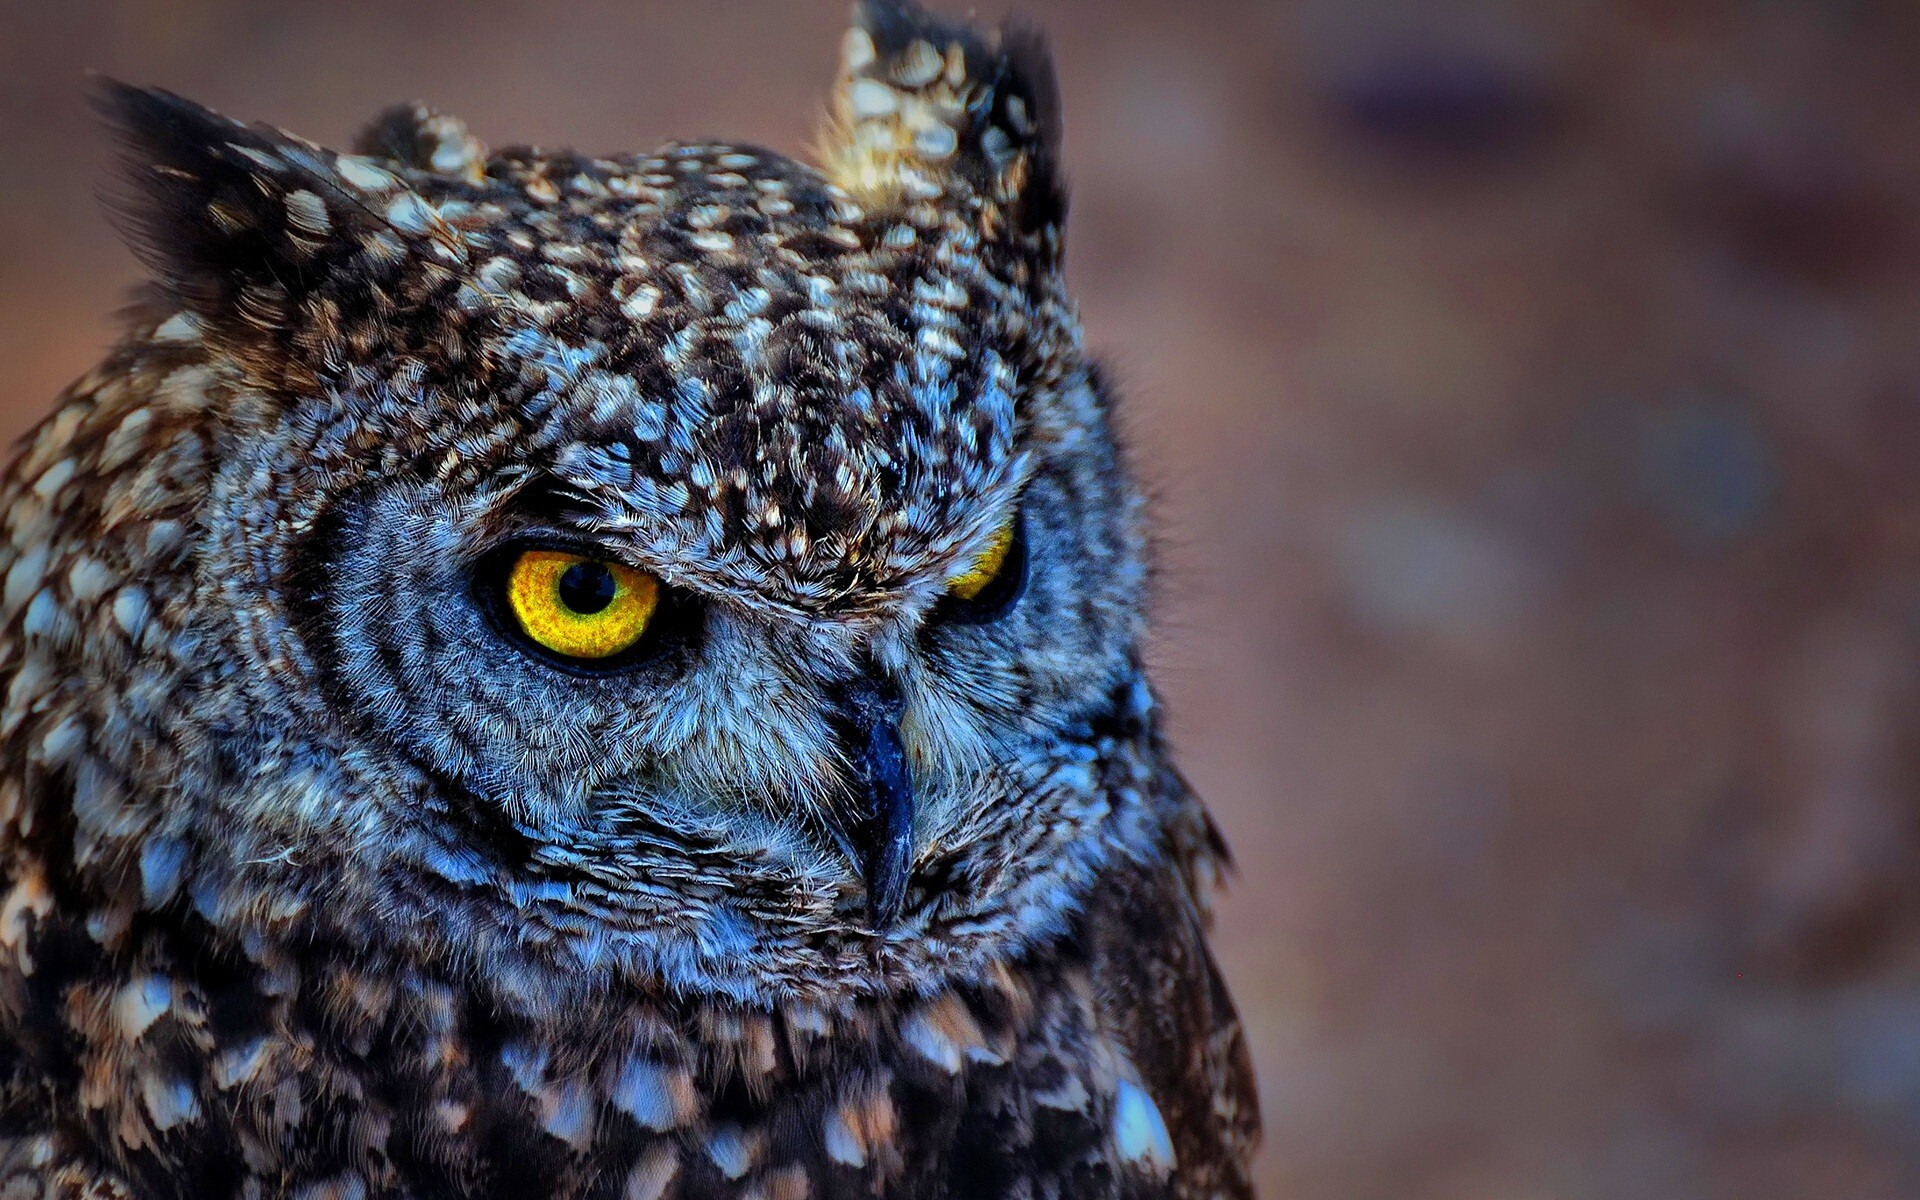 eastern screech owl bird with yellow eye wallpaper hd wallpapers